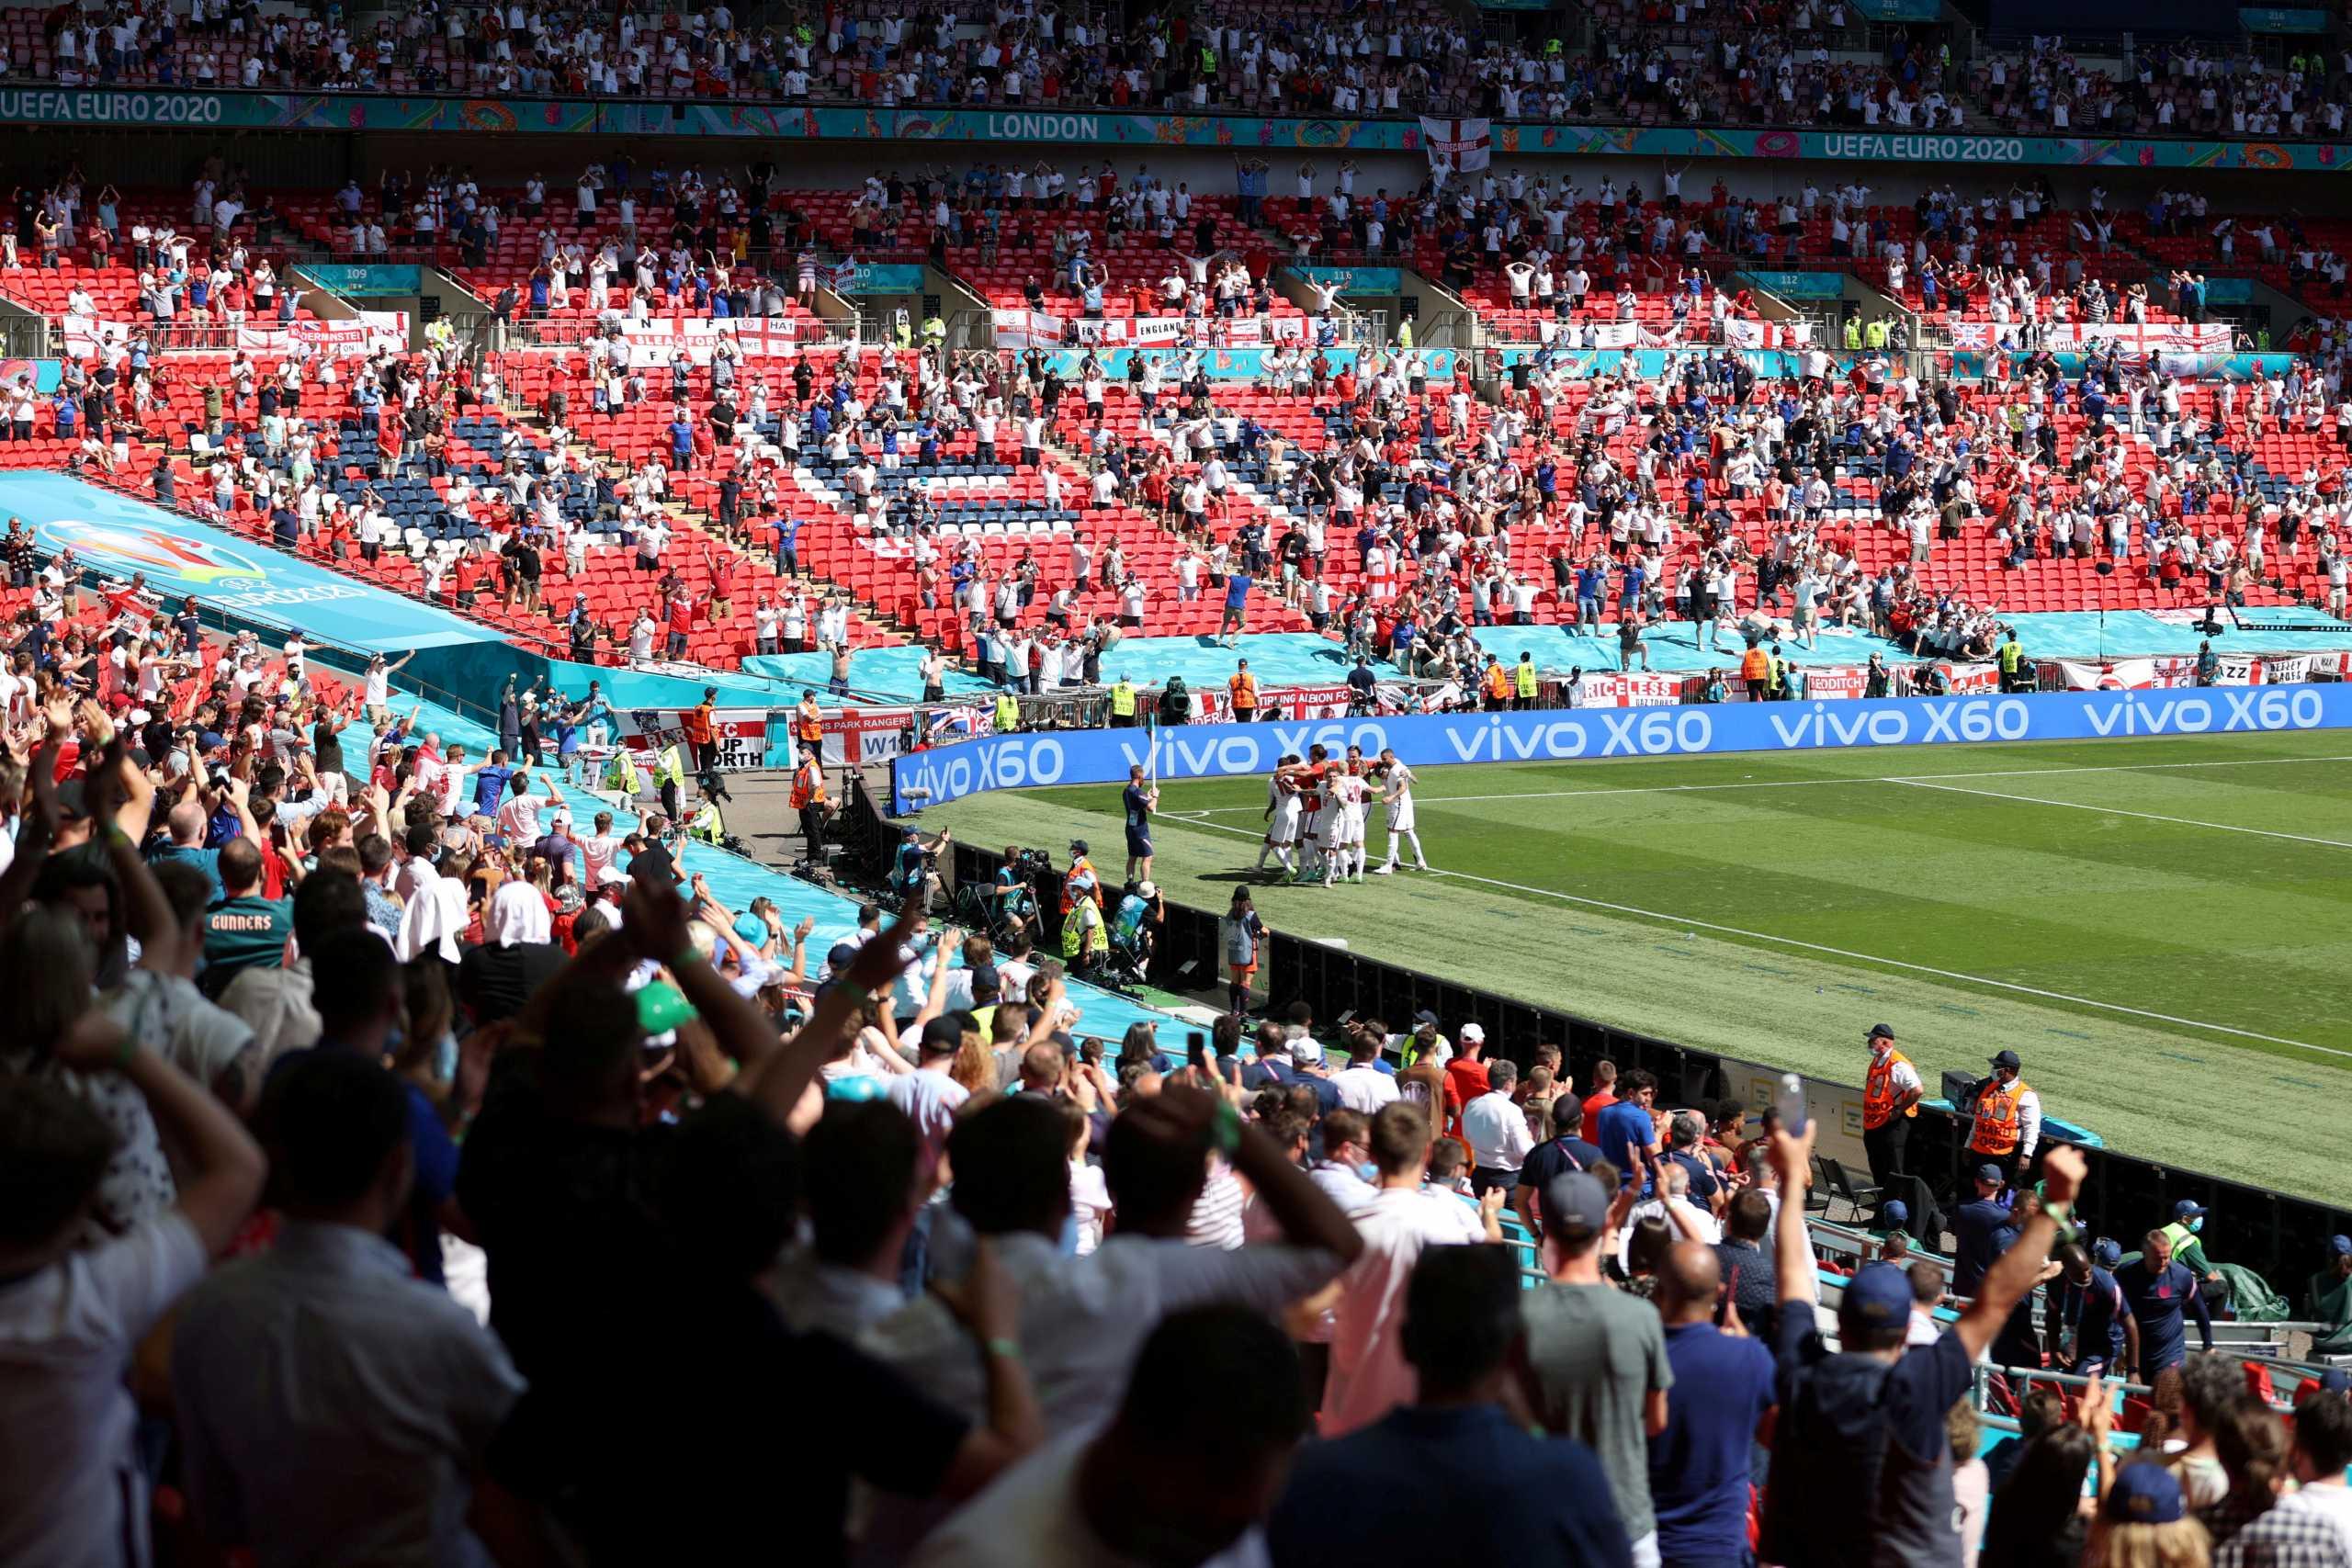 Euro 2020: Η UEFA απειλεί να πάρει τους ημιτελικούς και τον τελικό από το Γουέμπλεϊ